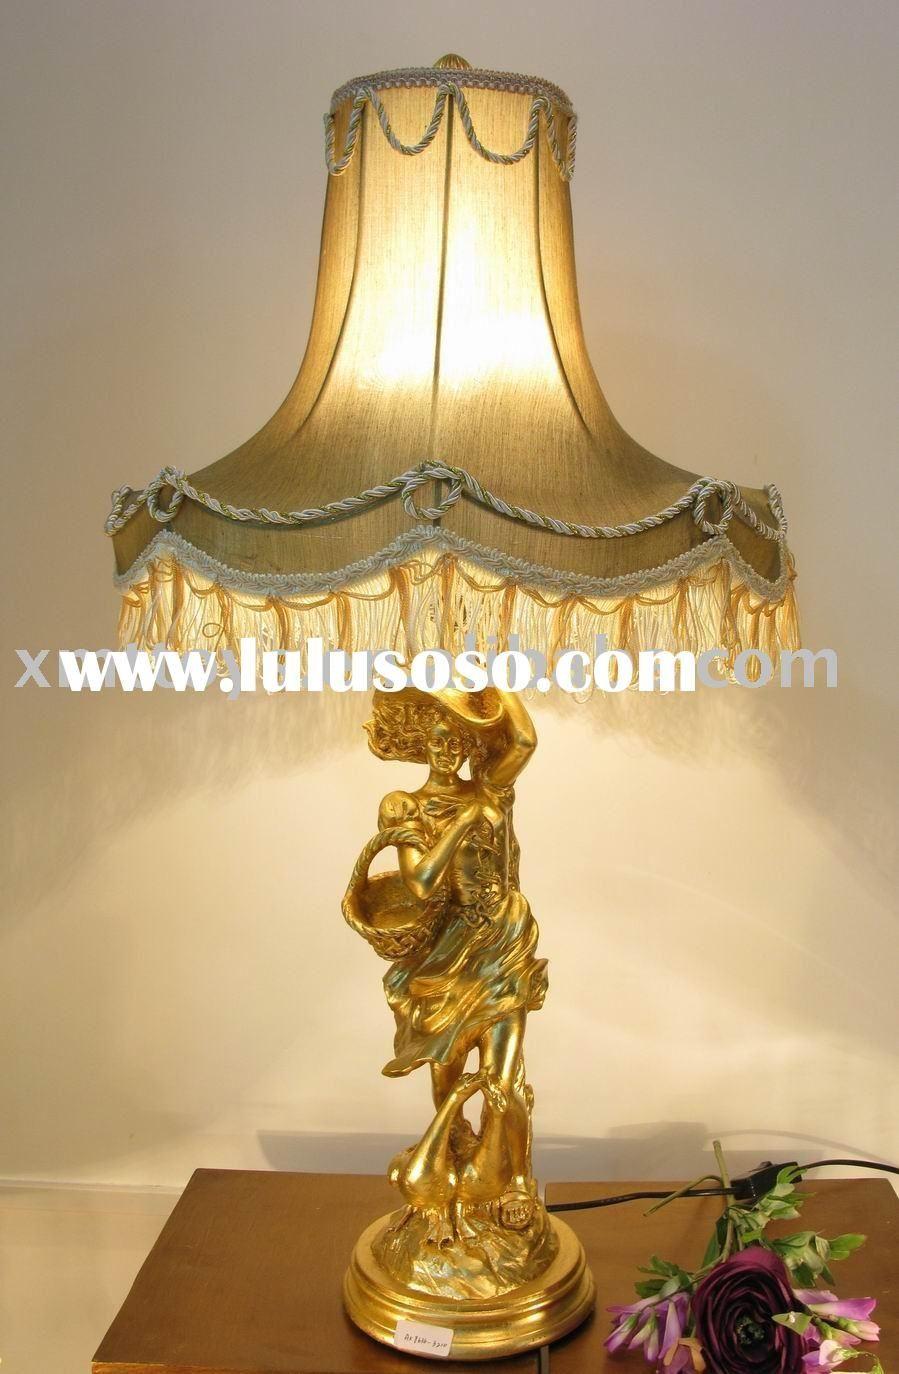 Decorative Lamp Shades Decorative Lamp Shades Vintagelampshadethriftstores Floor Lamp Shades Shabby Chic Lamp Shades Antique Lamp Shades